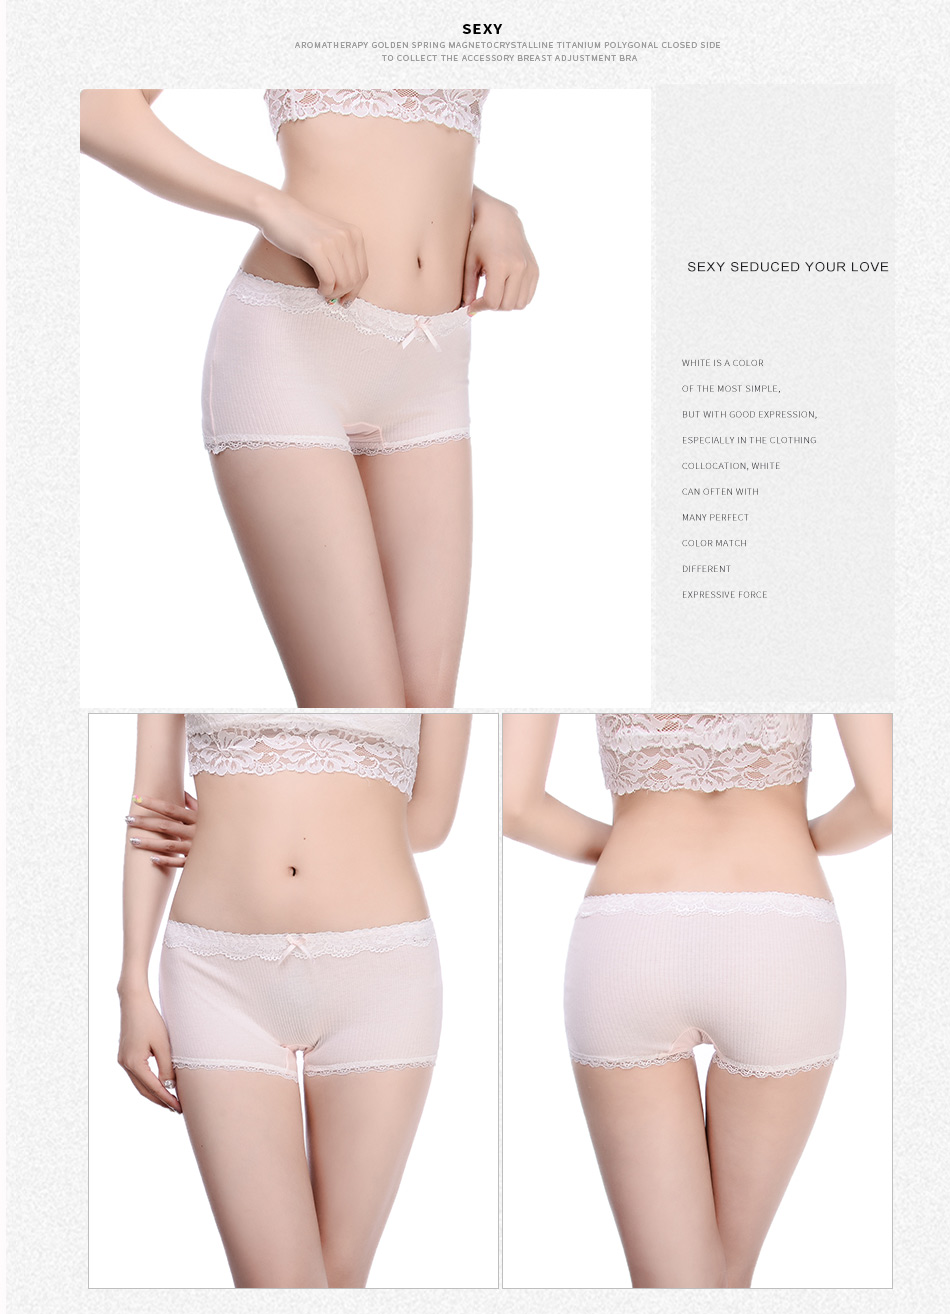 acd50cf8e422 Innsly Women briefs Low-Rise Panties Female Sexy Panties 100% Cotton Animal  print briefs Ladies lingeries Women UnderwearUSD 1.39-1.55 piece